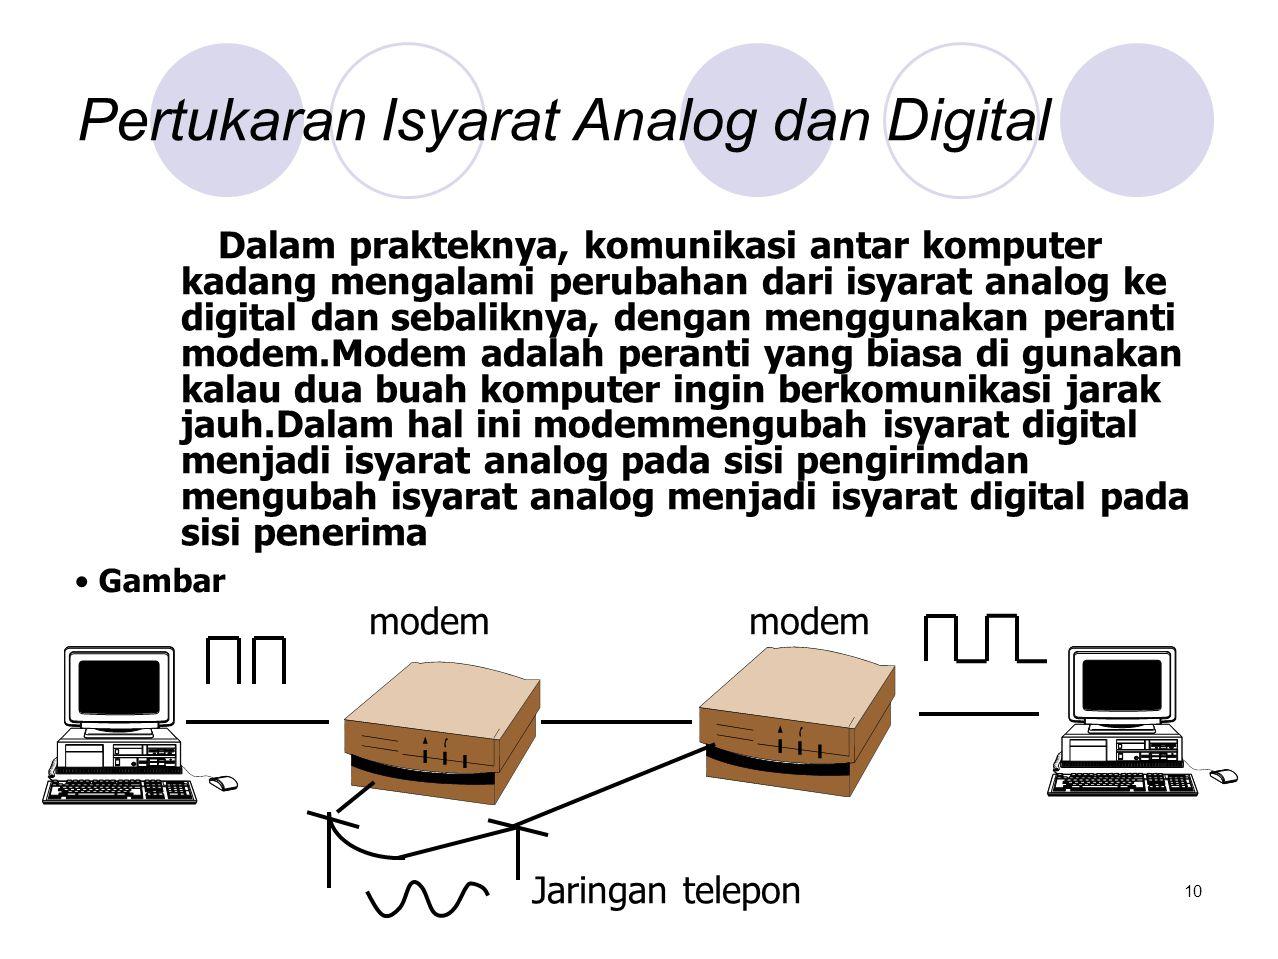 Pertukaran Isyarat Analog dan Digital Dalam prakteknya, komunikasi antar komputer kadang mengalami perubahan dari isyarat analog ke digital dan sebali